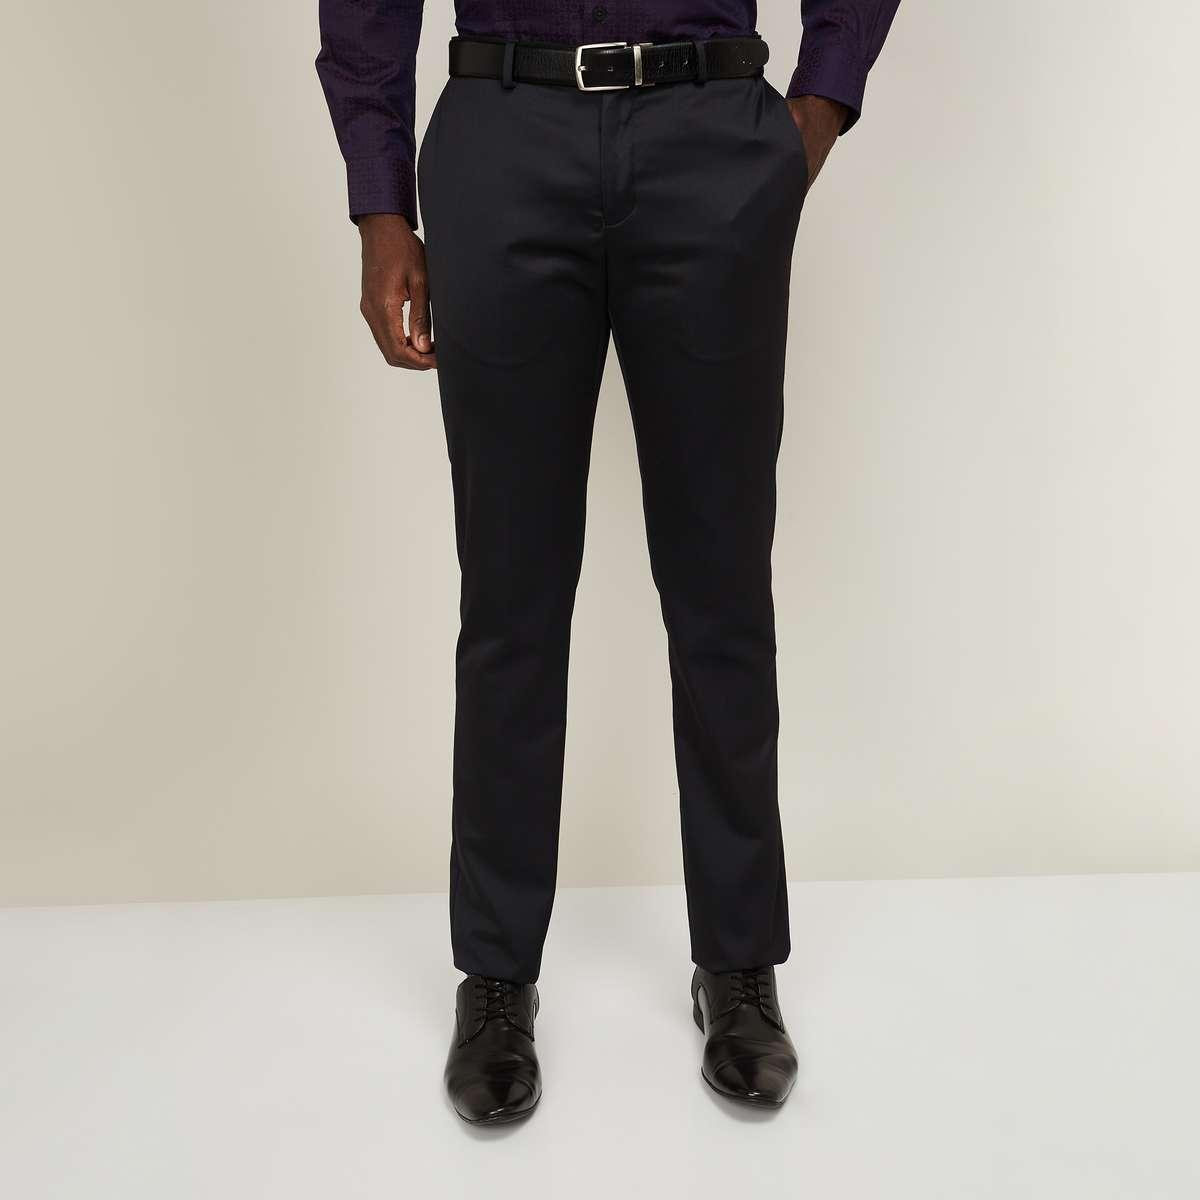 1.BLACKBERRYS Men Solid Slim Straight Formal Trousers